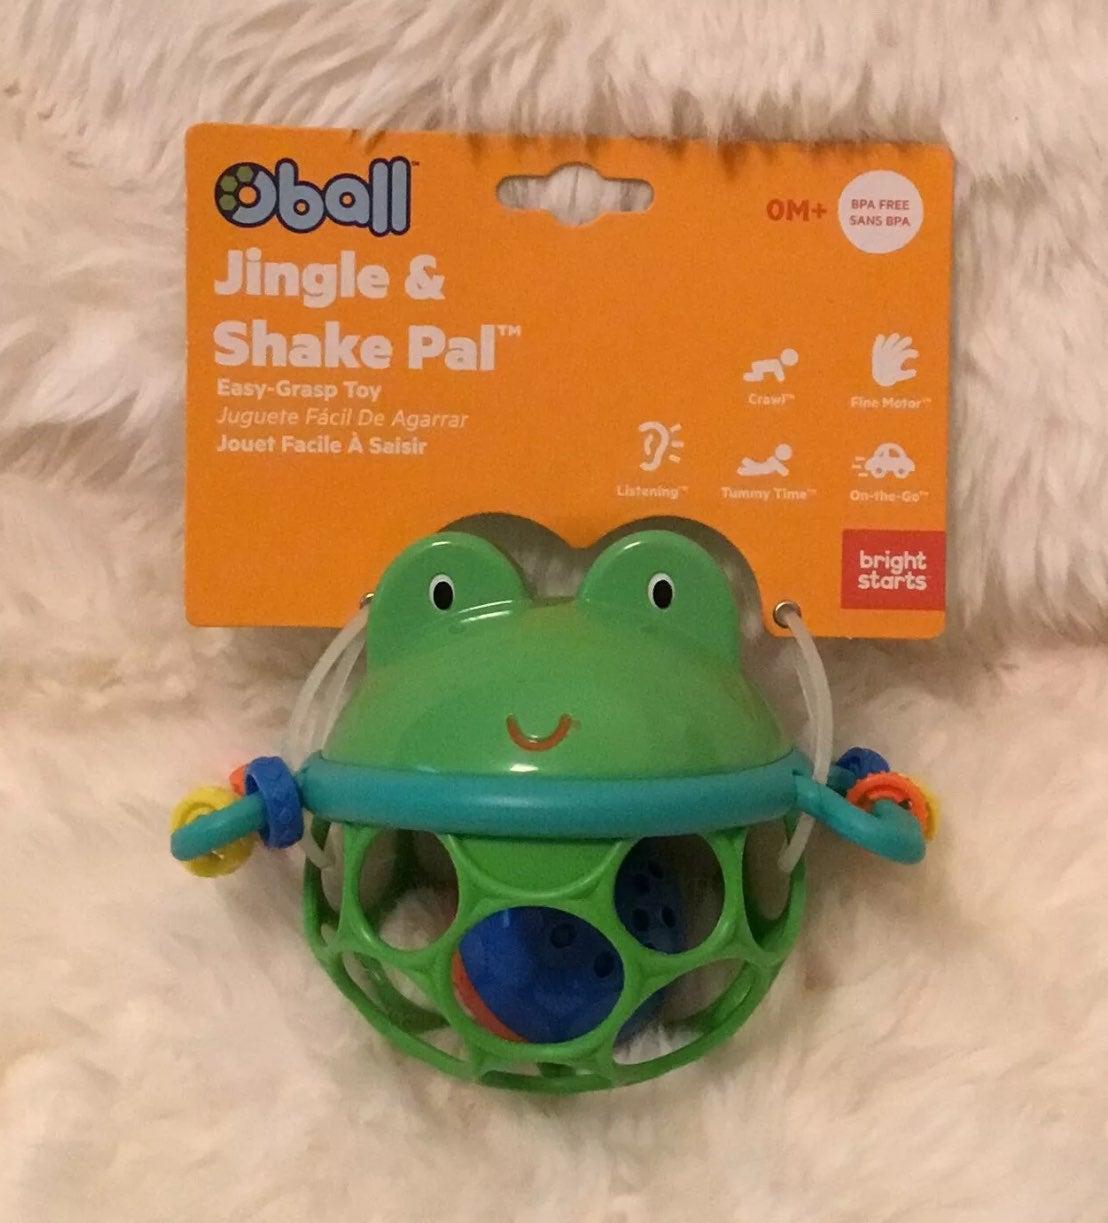 Oball Jingle & Shake Pal Easy-Grasp Ratt